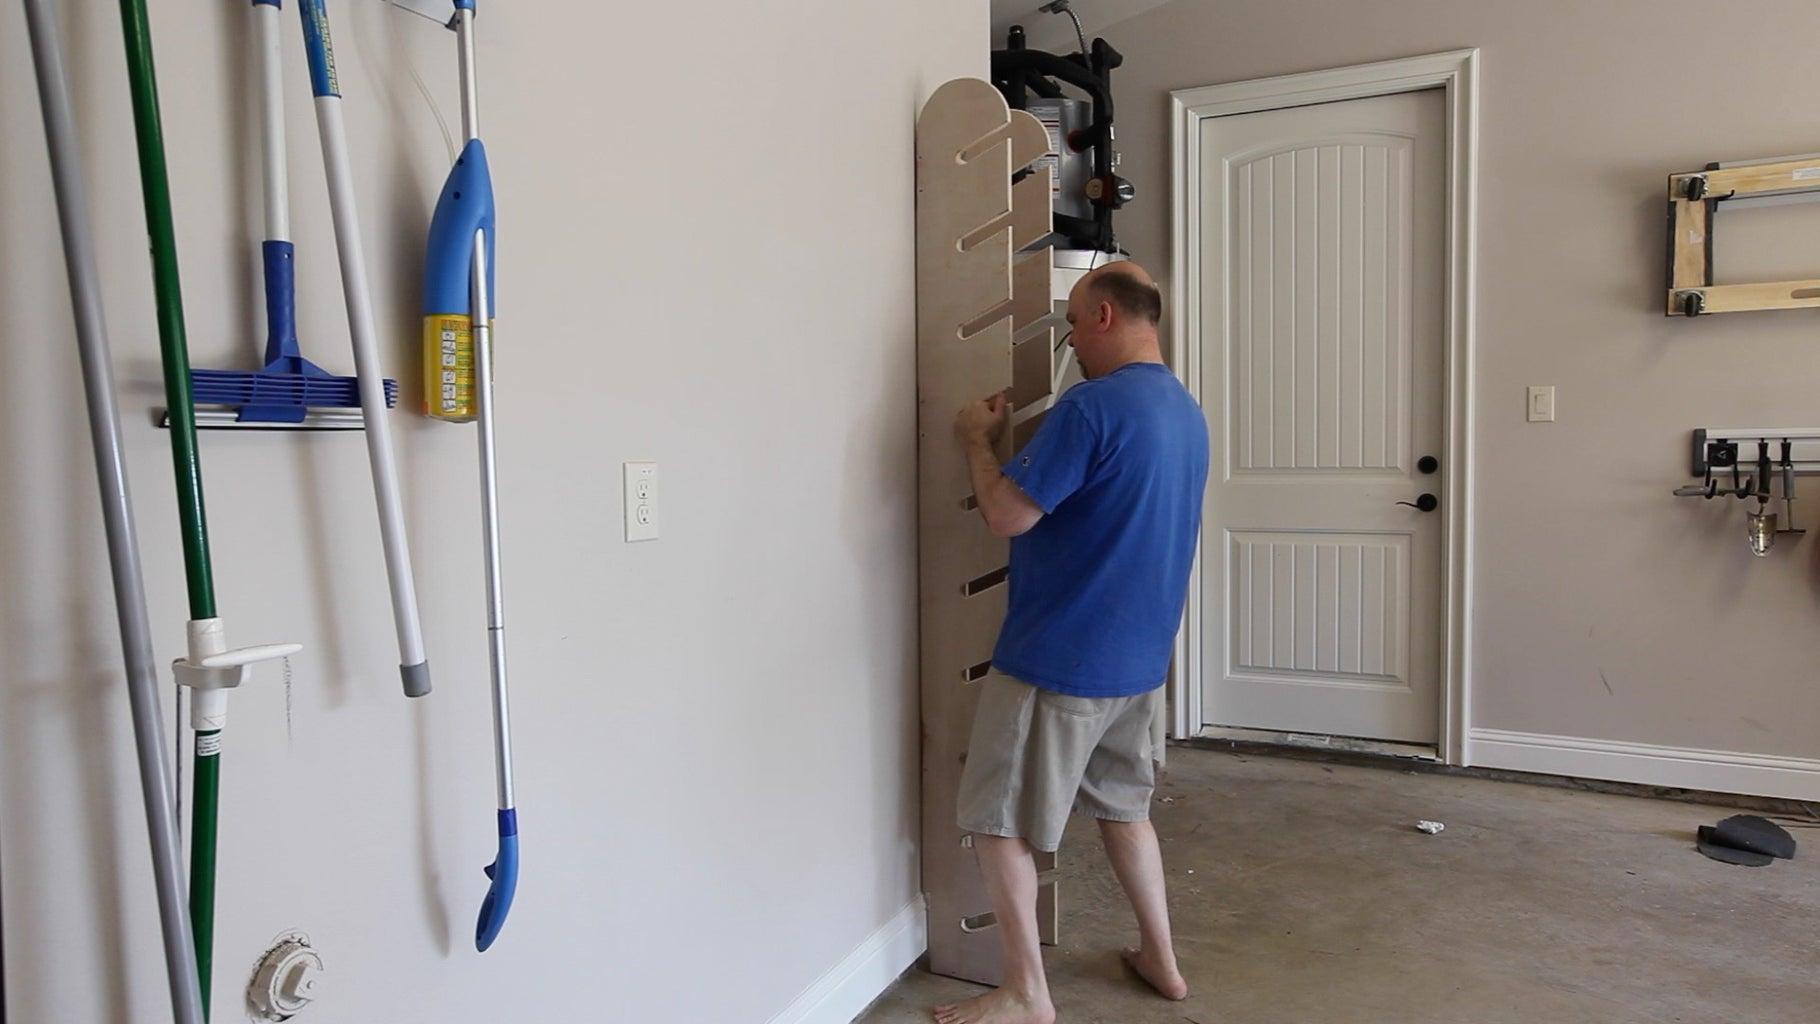 Using the Skateboard Display Rack